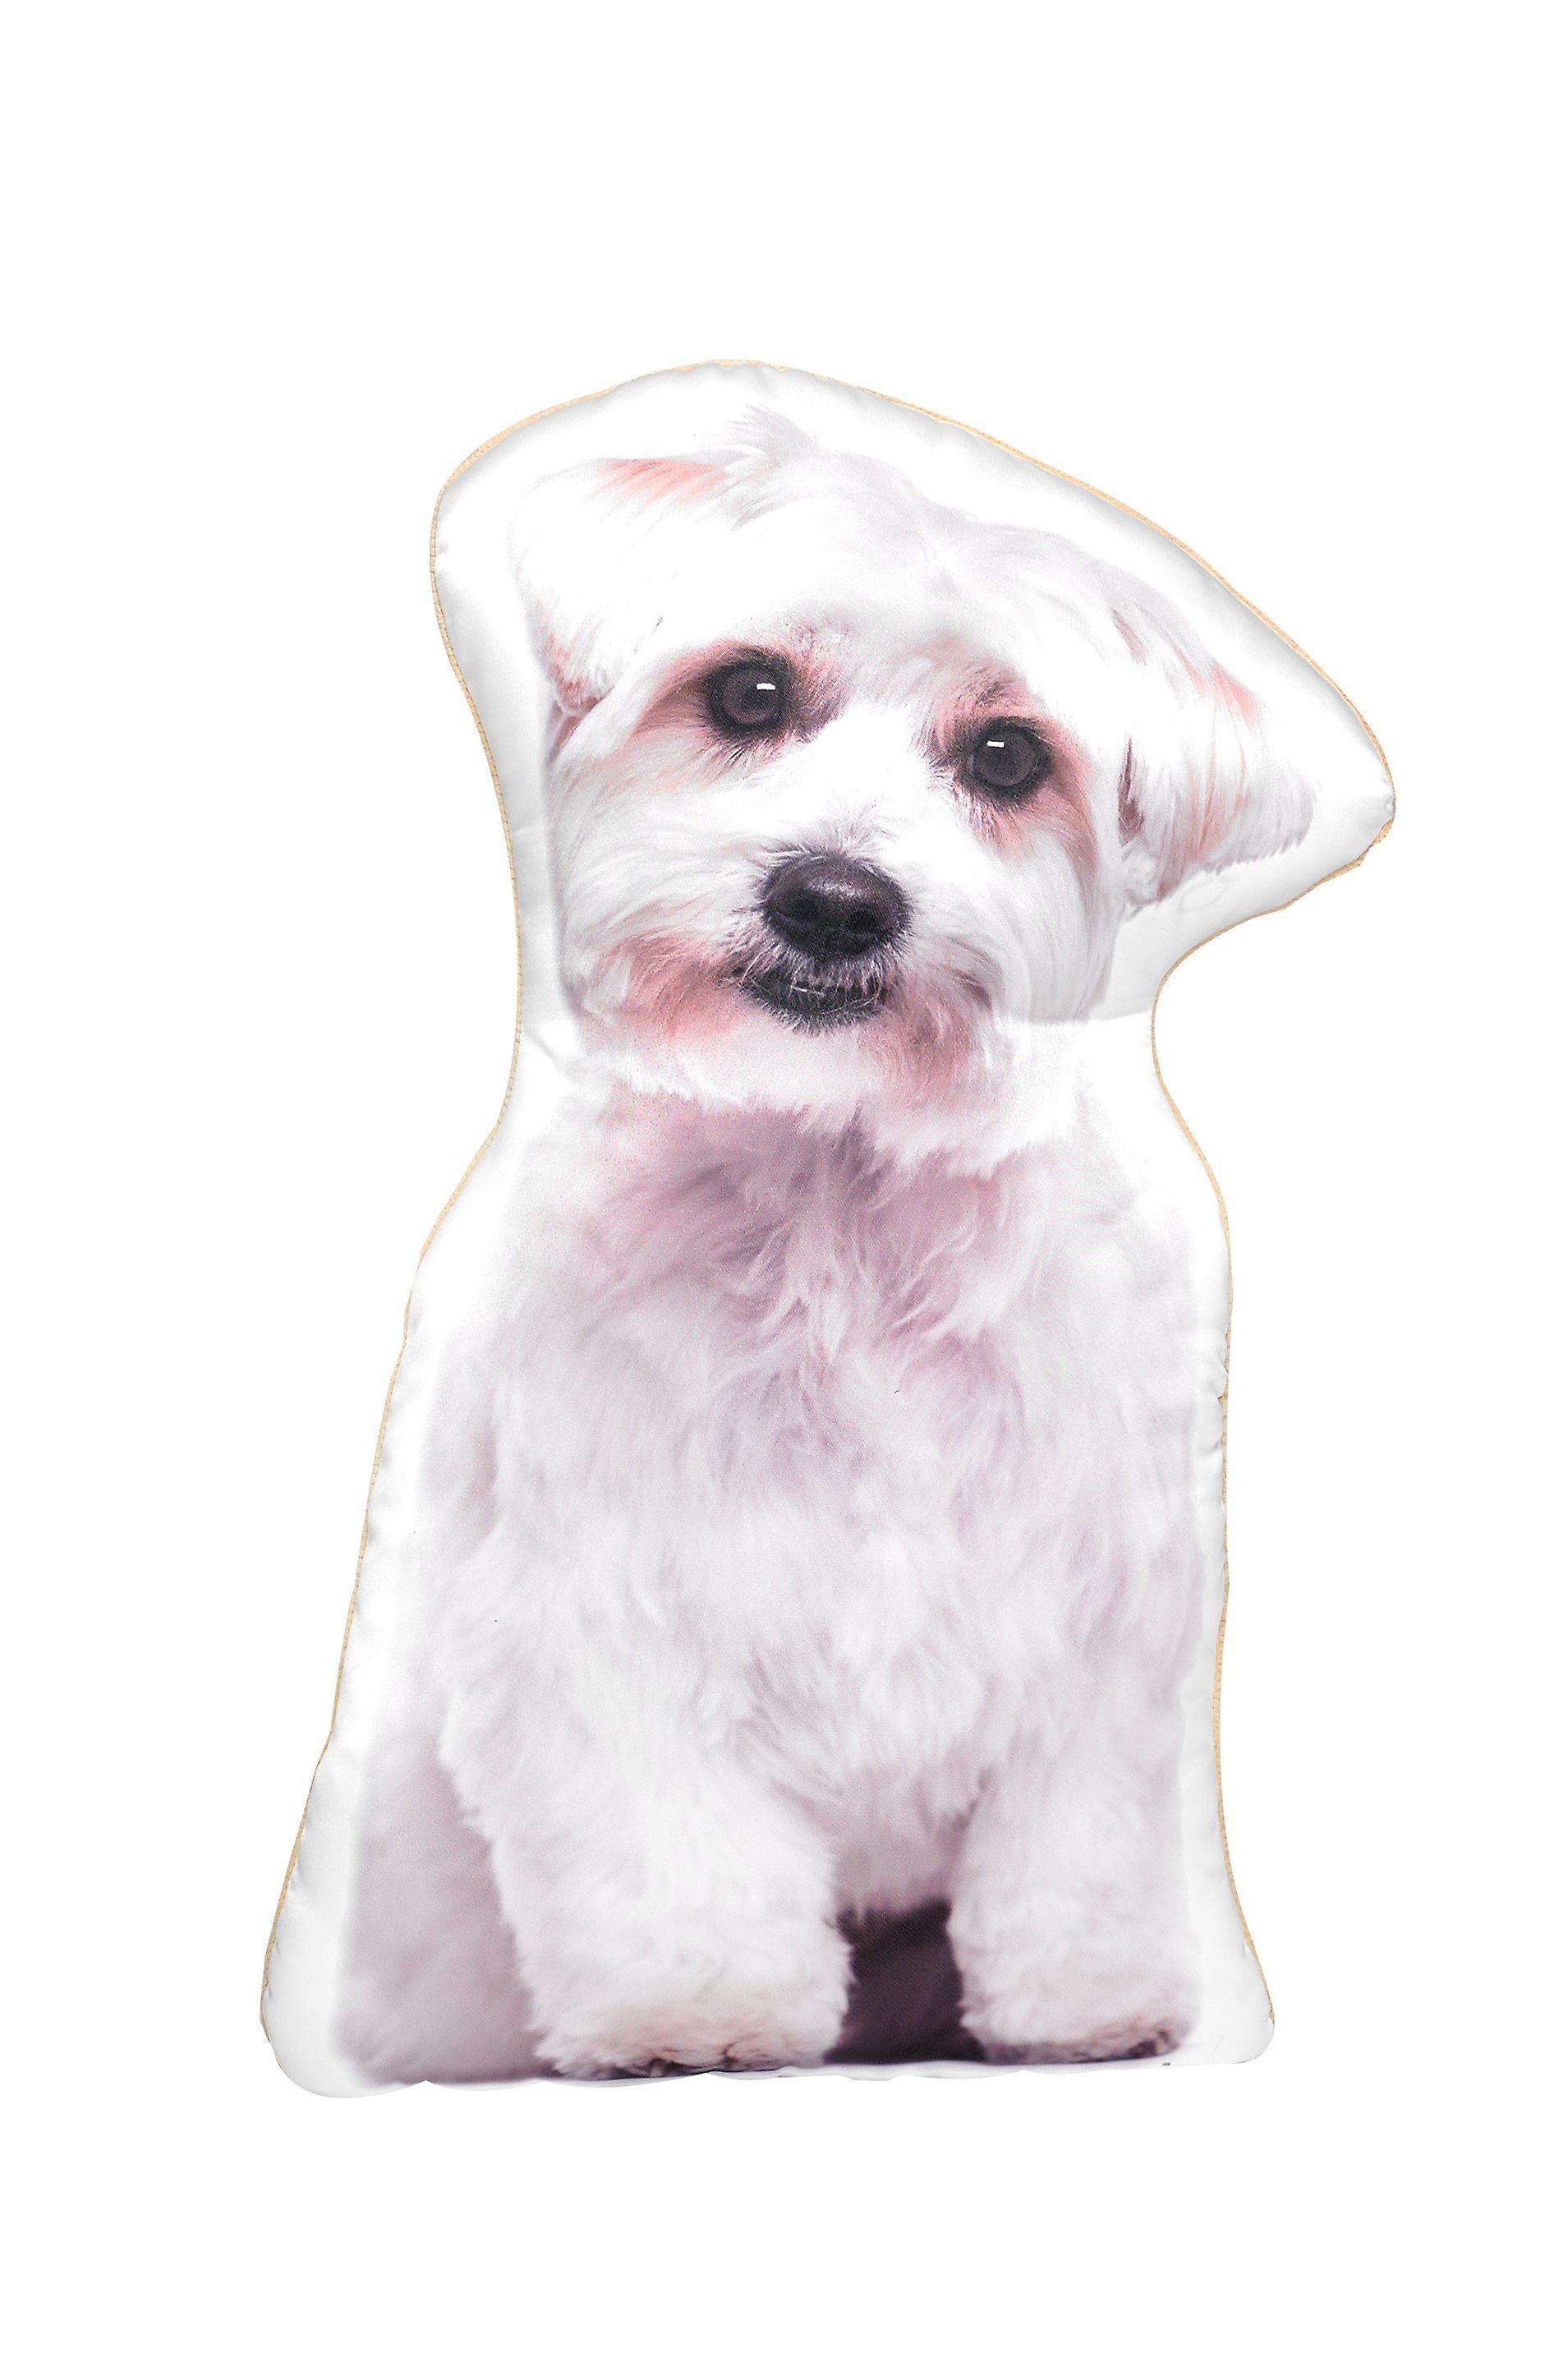 Adorable maltese shaped cushion